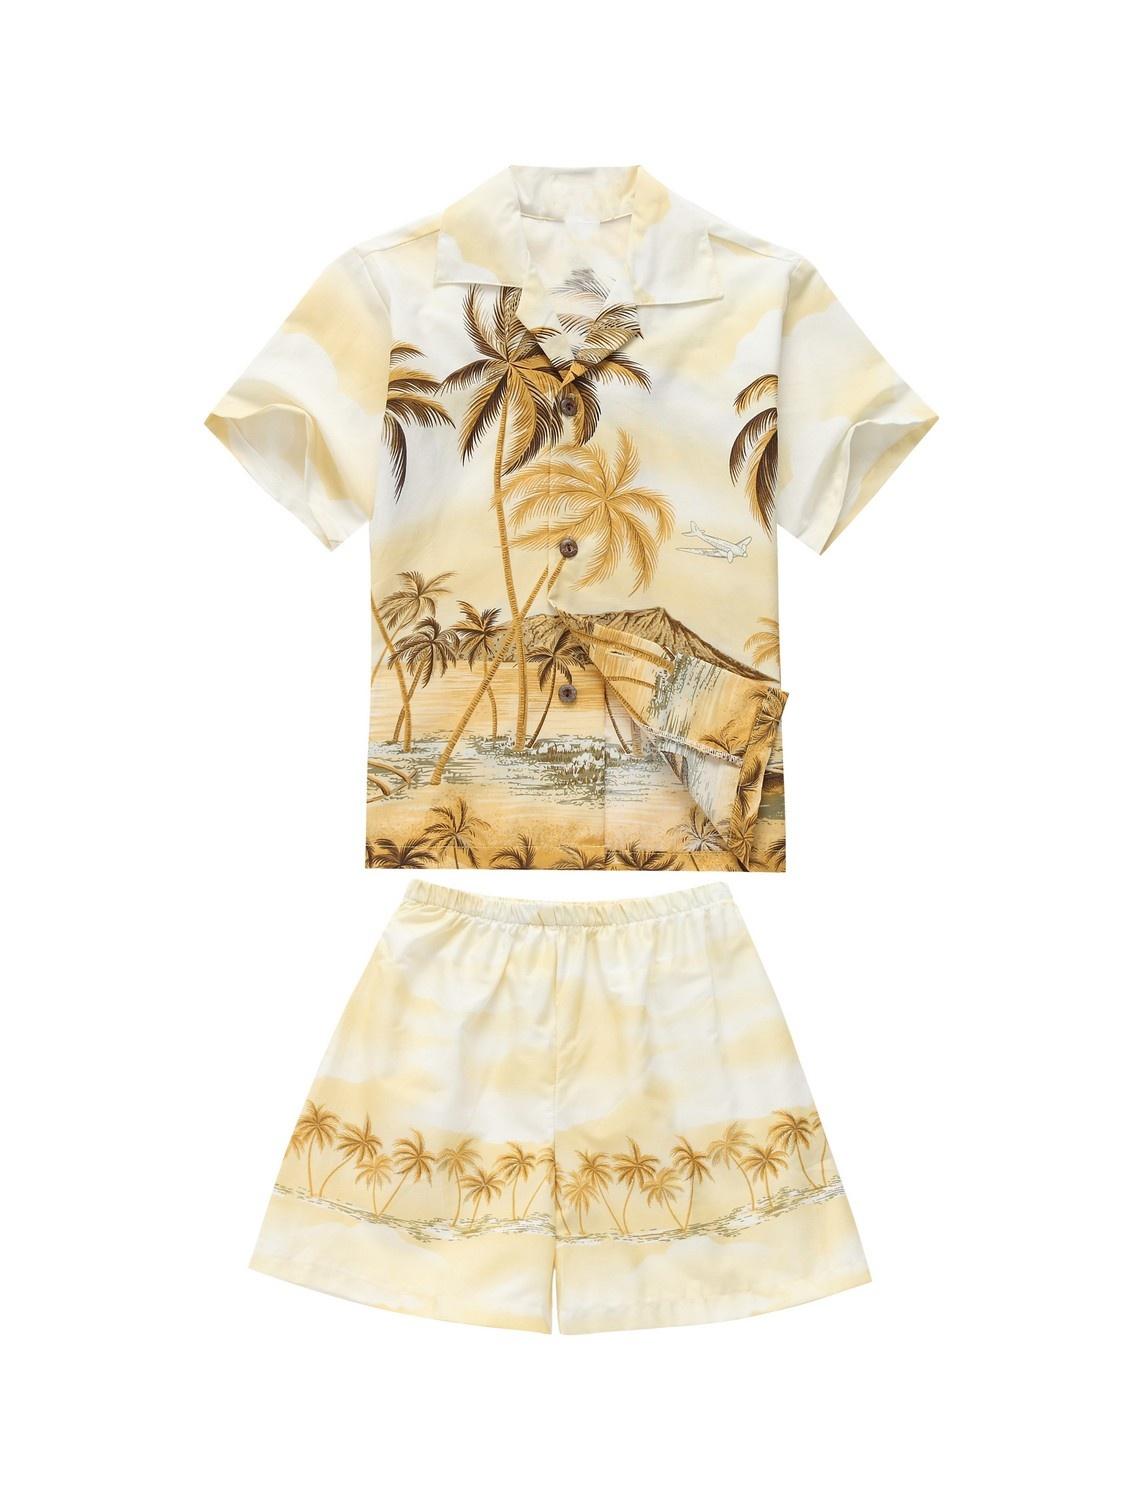 Made in Hawaii Luau Aloha Shirt and Shorts Boy Cabana Set Palm Edge Yellow 6